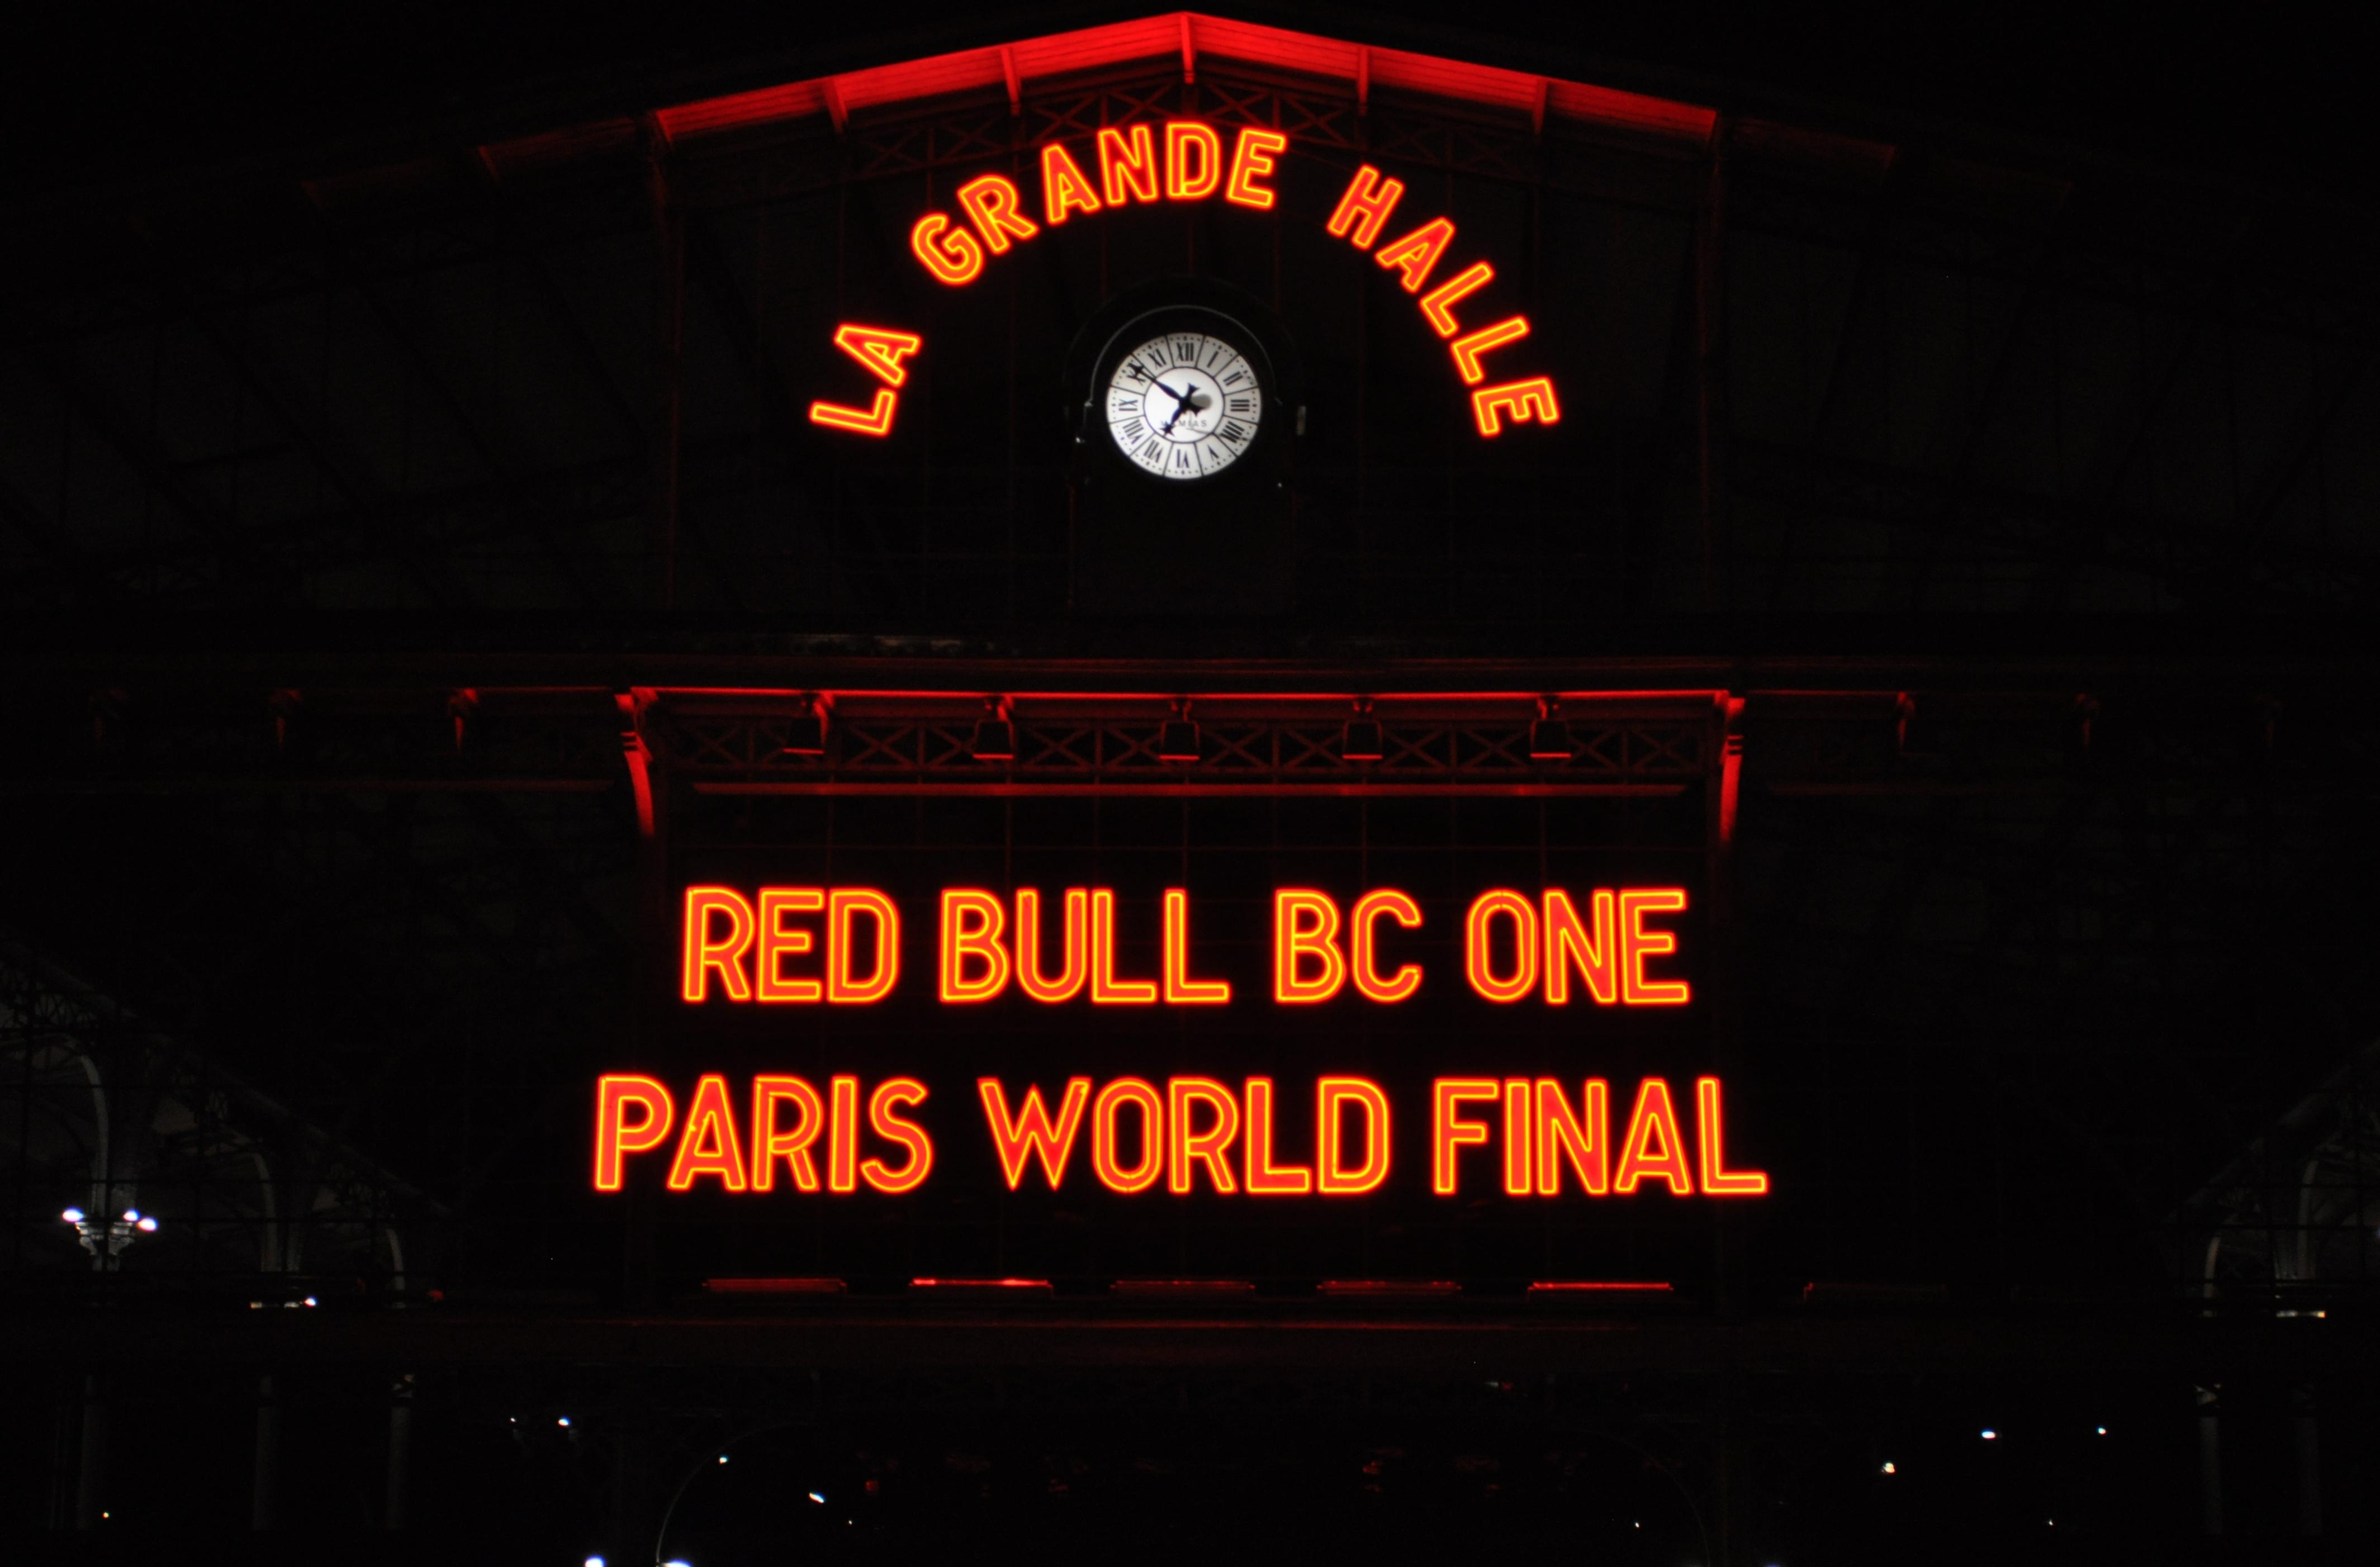 RedBull-BC-One-World-Final-Paris (1)